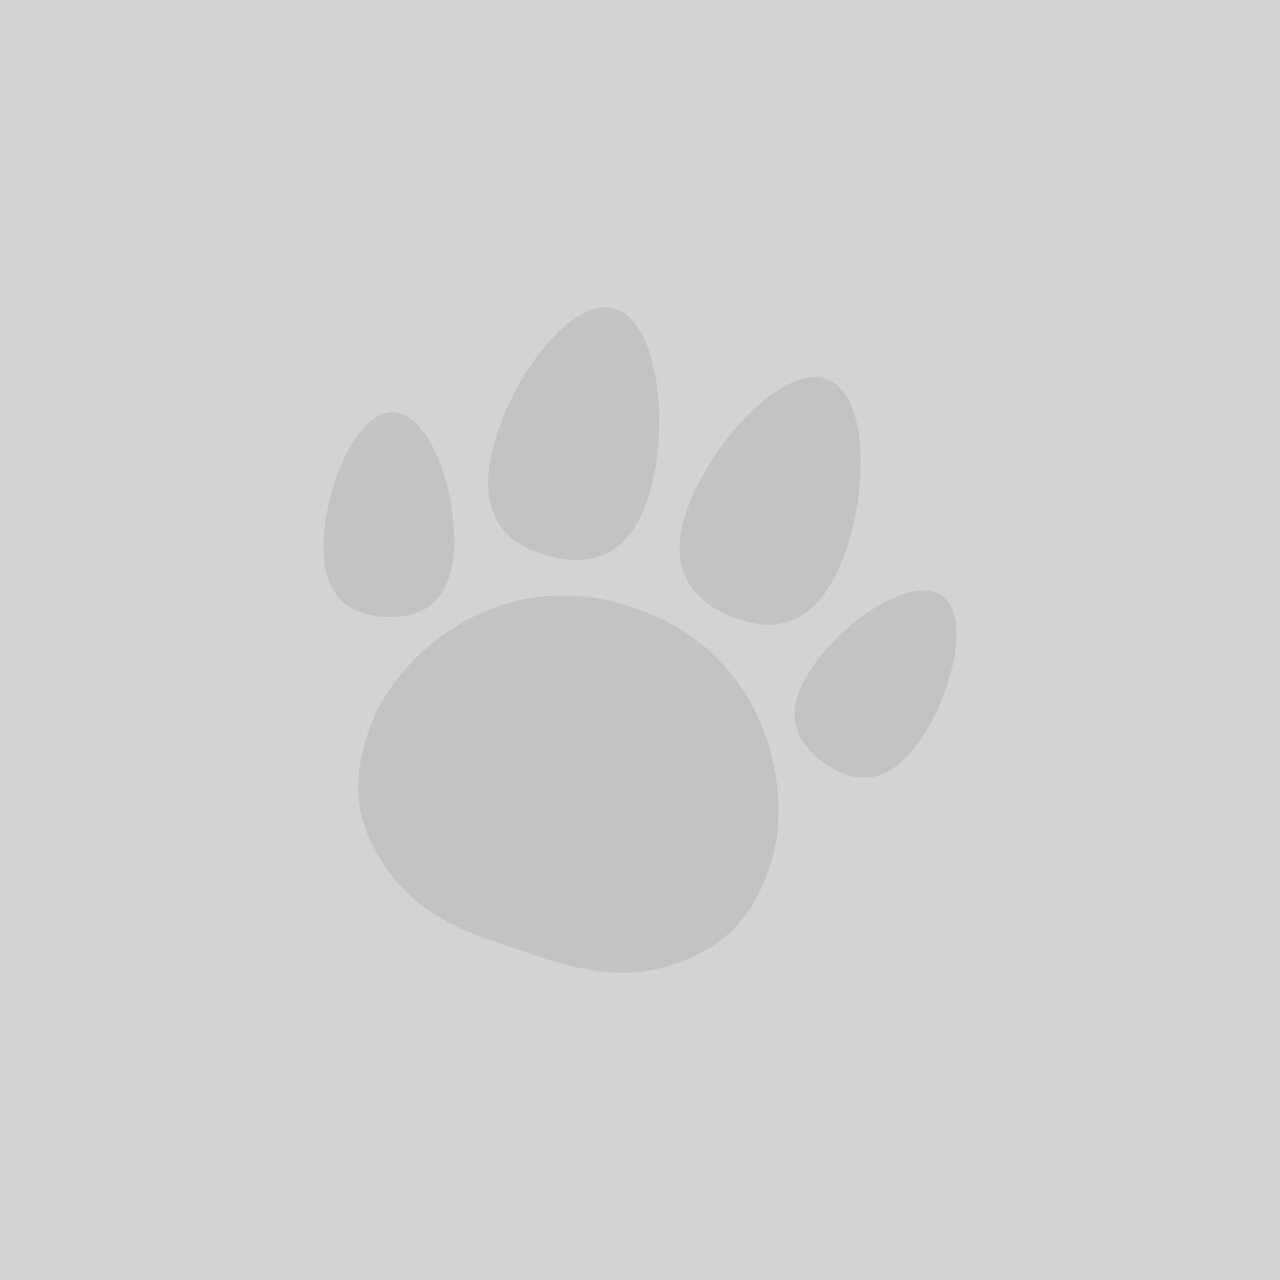 James Wellbeloved CrackerJacks - Lamb Without Cereals 225g